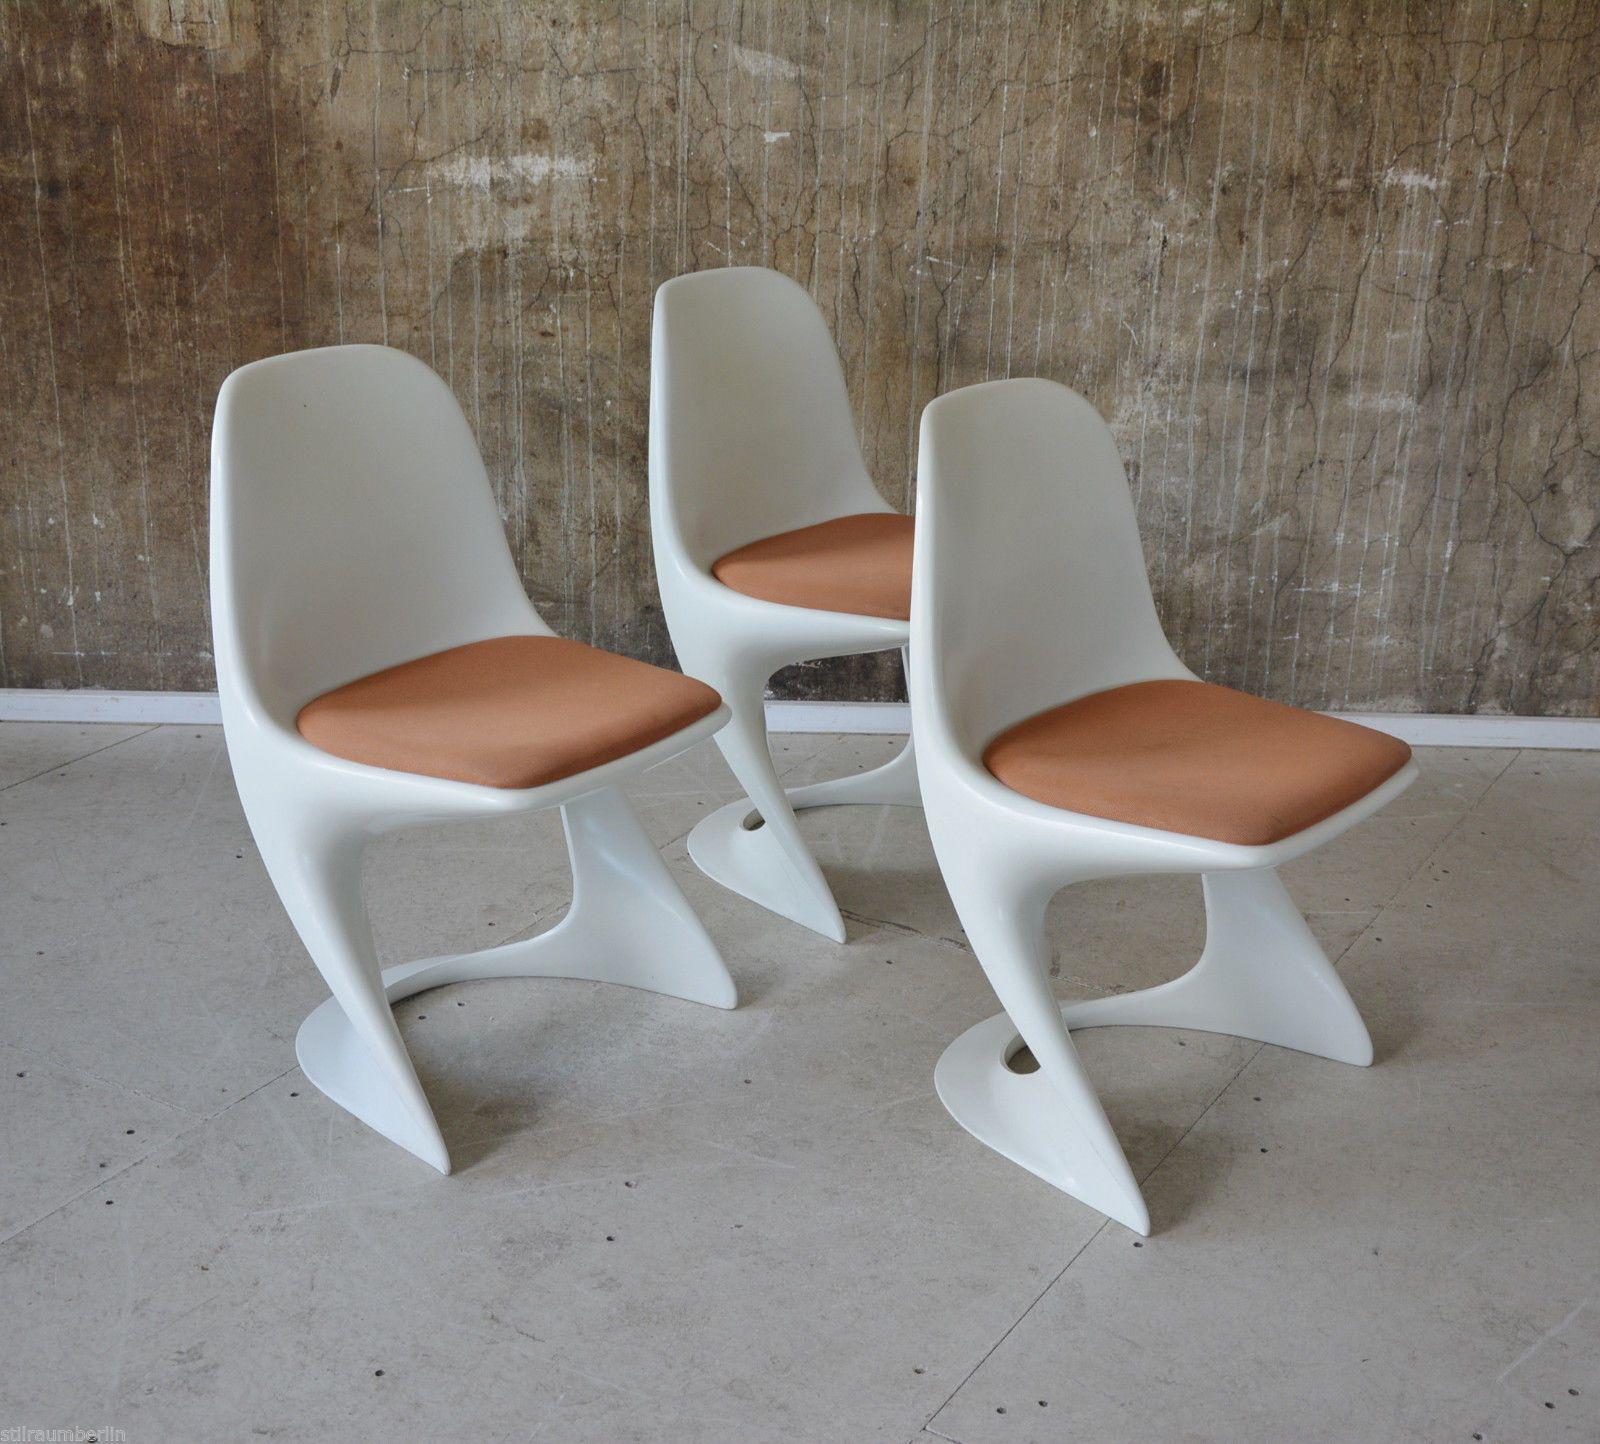 1(3) CASALA Stuhl ALEXANDER BEGGE chair SPACE AGE eames panton ära I ...